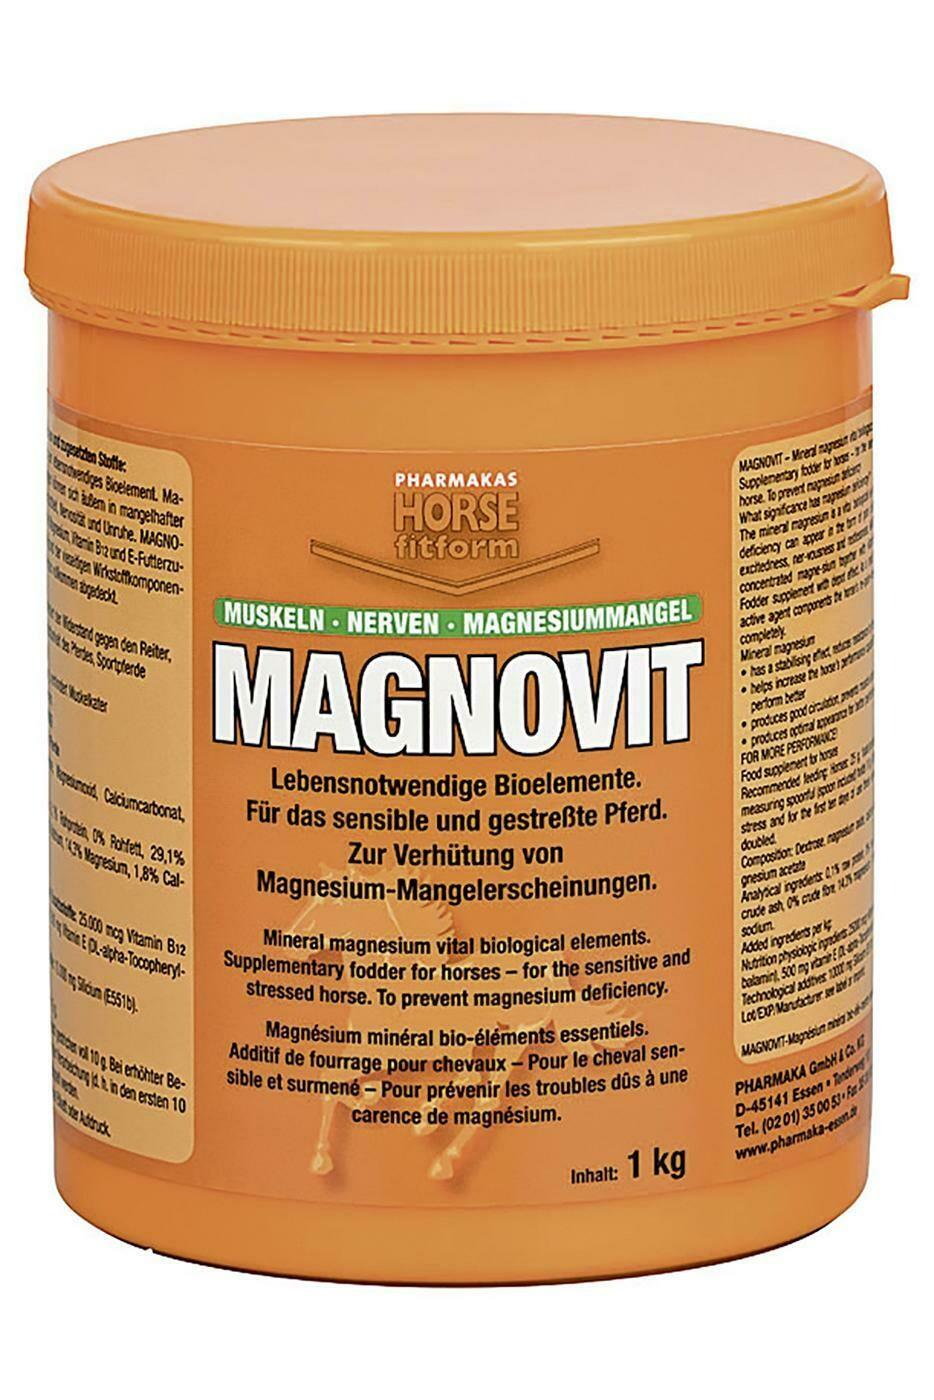 Magnovit